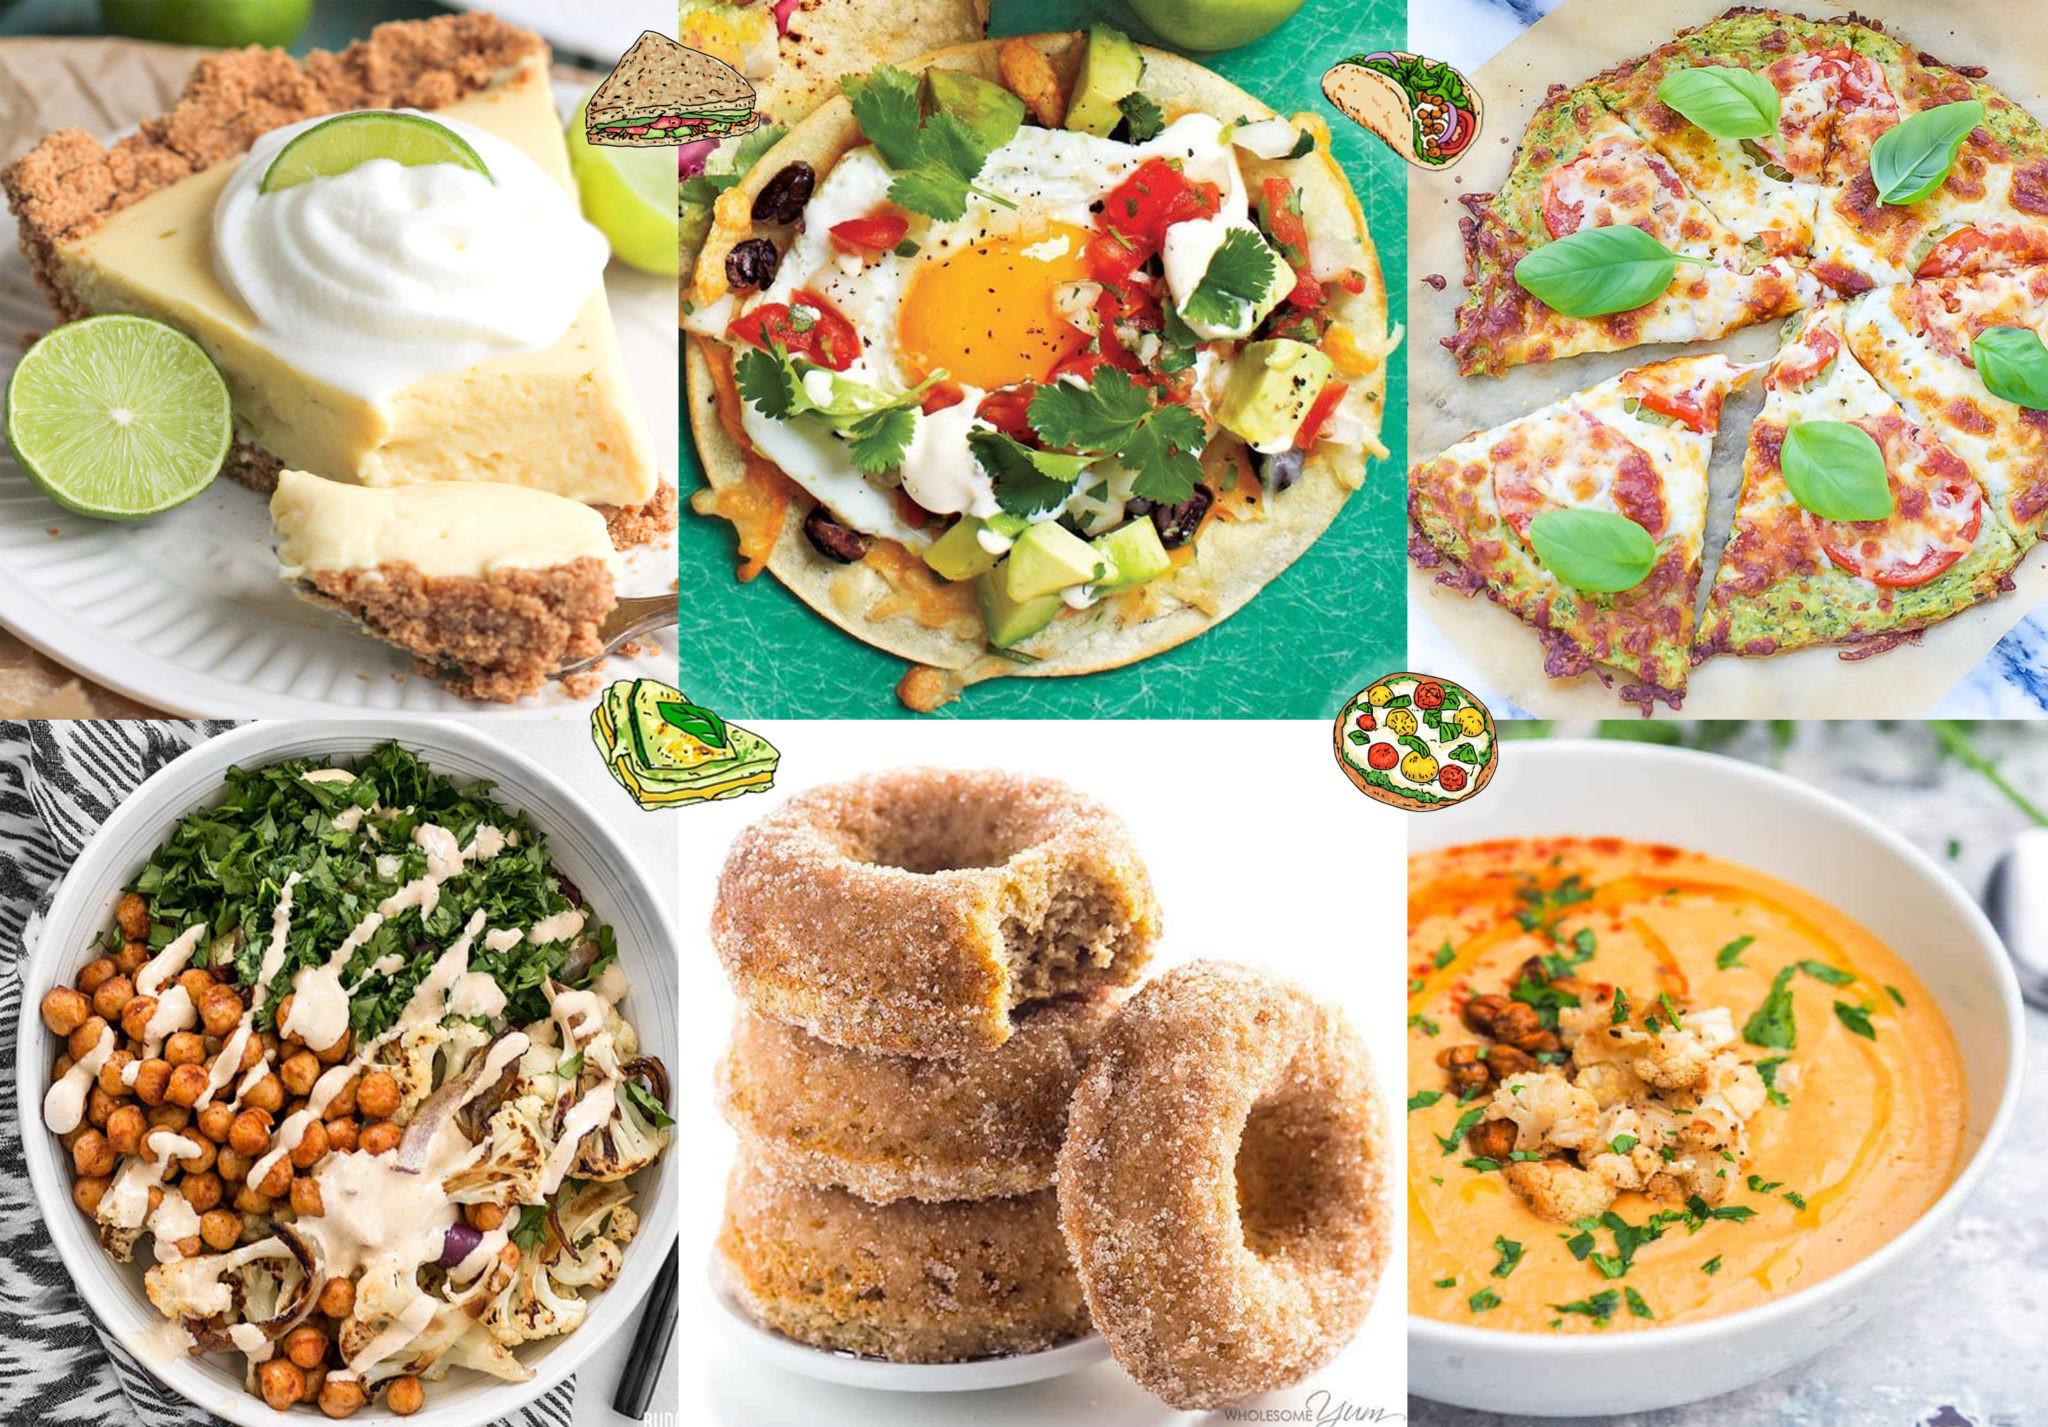 Low Cal Vegetarian Recipes  Low Calorie Ve arian and Vegan Recipes I Will Be Making